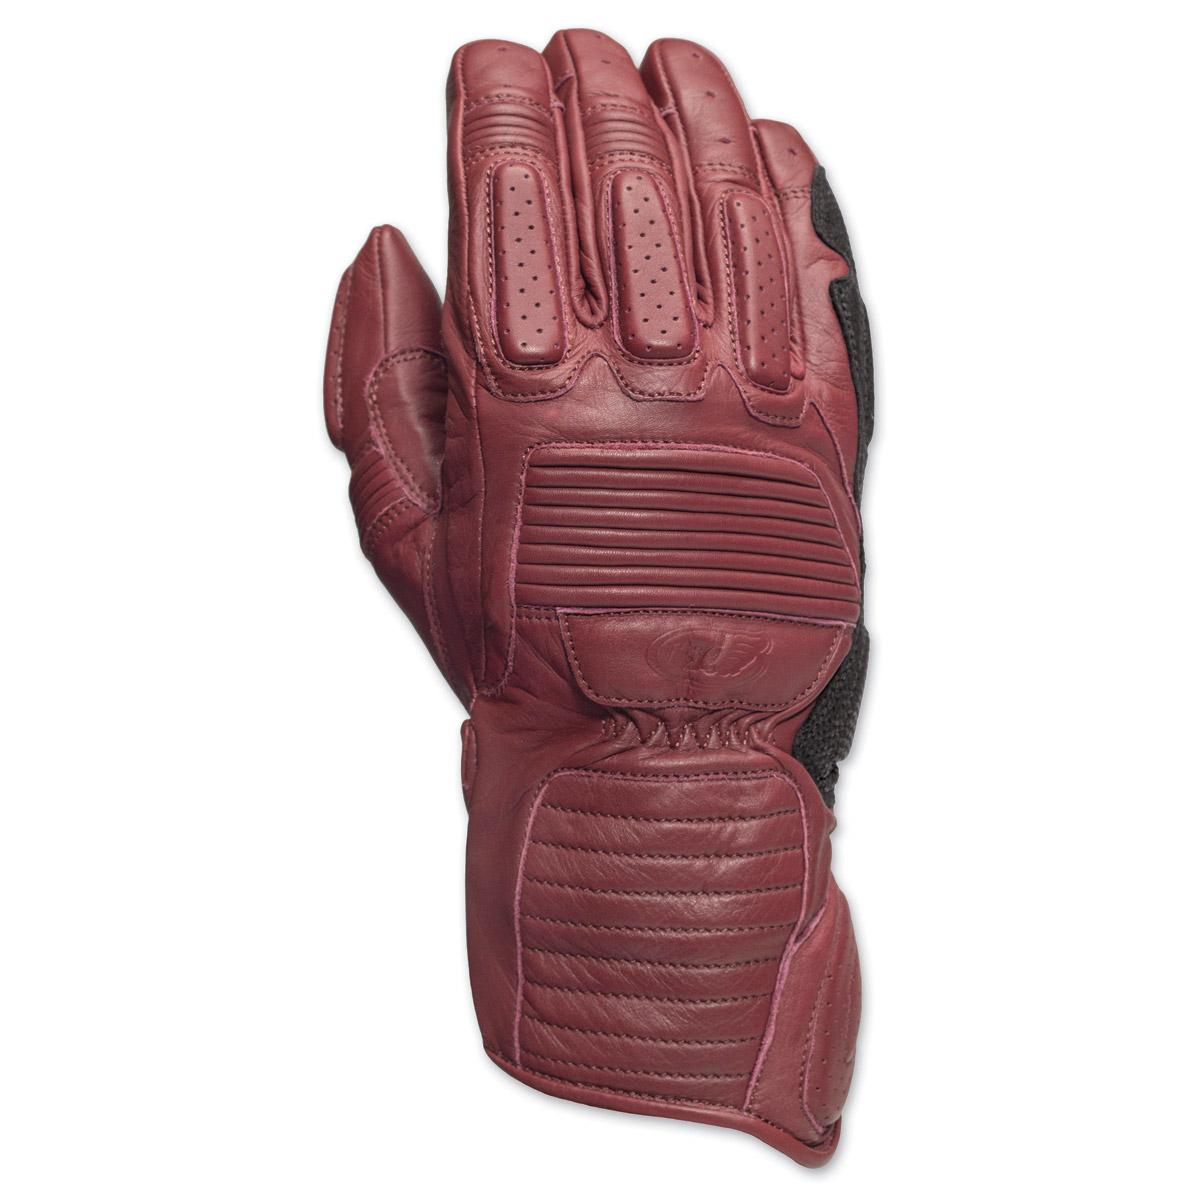 Motorcycle gloves with id pocket - Mens Oxblood Gloves Roland Sands Design Ace Men S Oxblood Leather Gloves